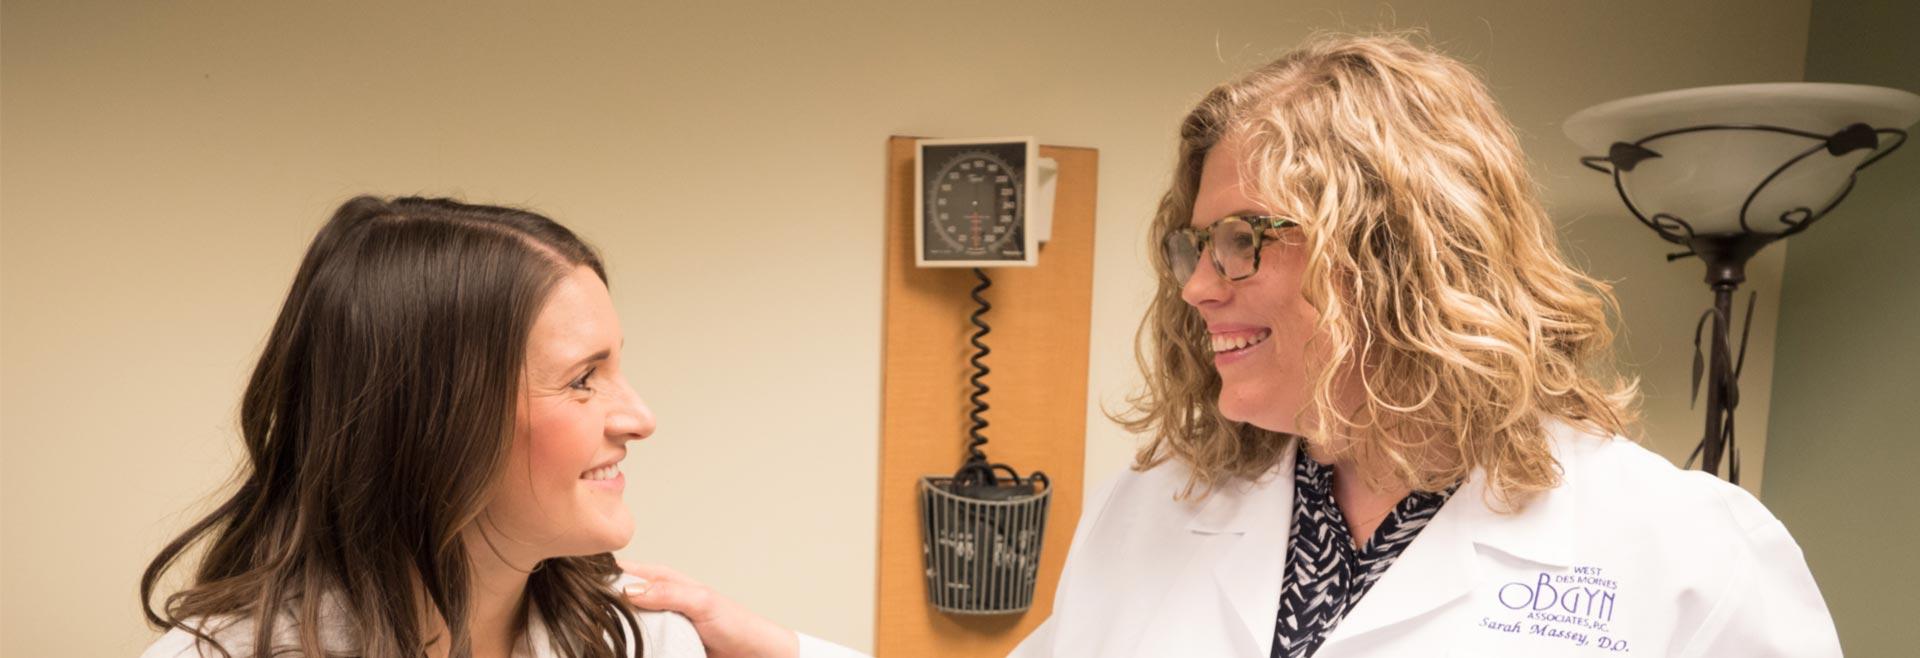 in office gynecology procedures